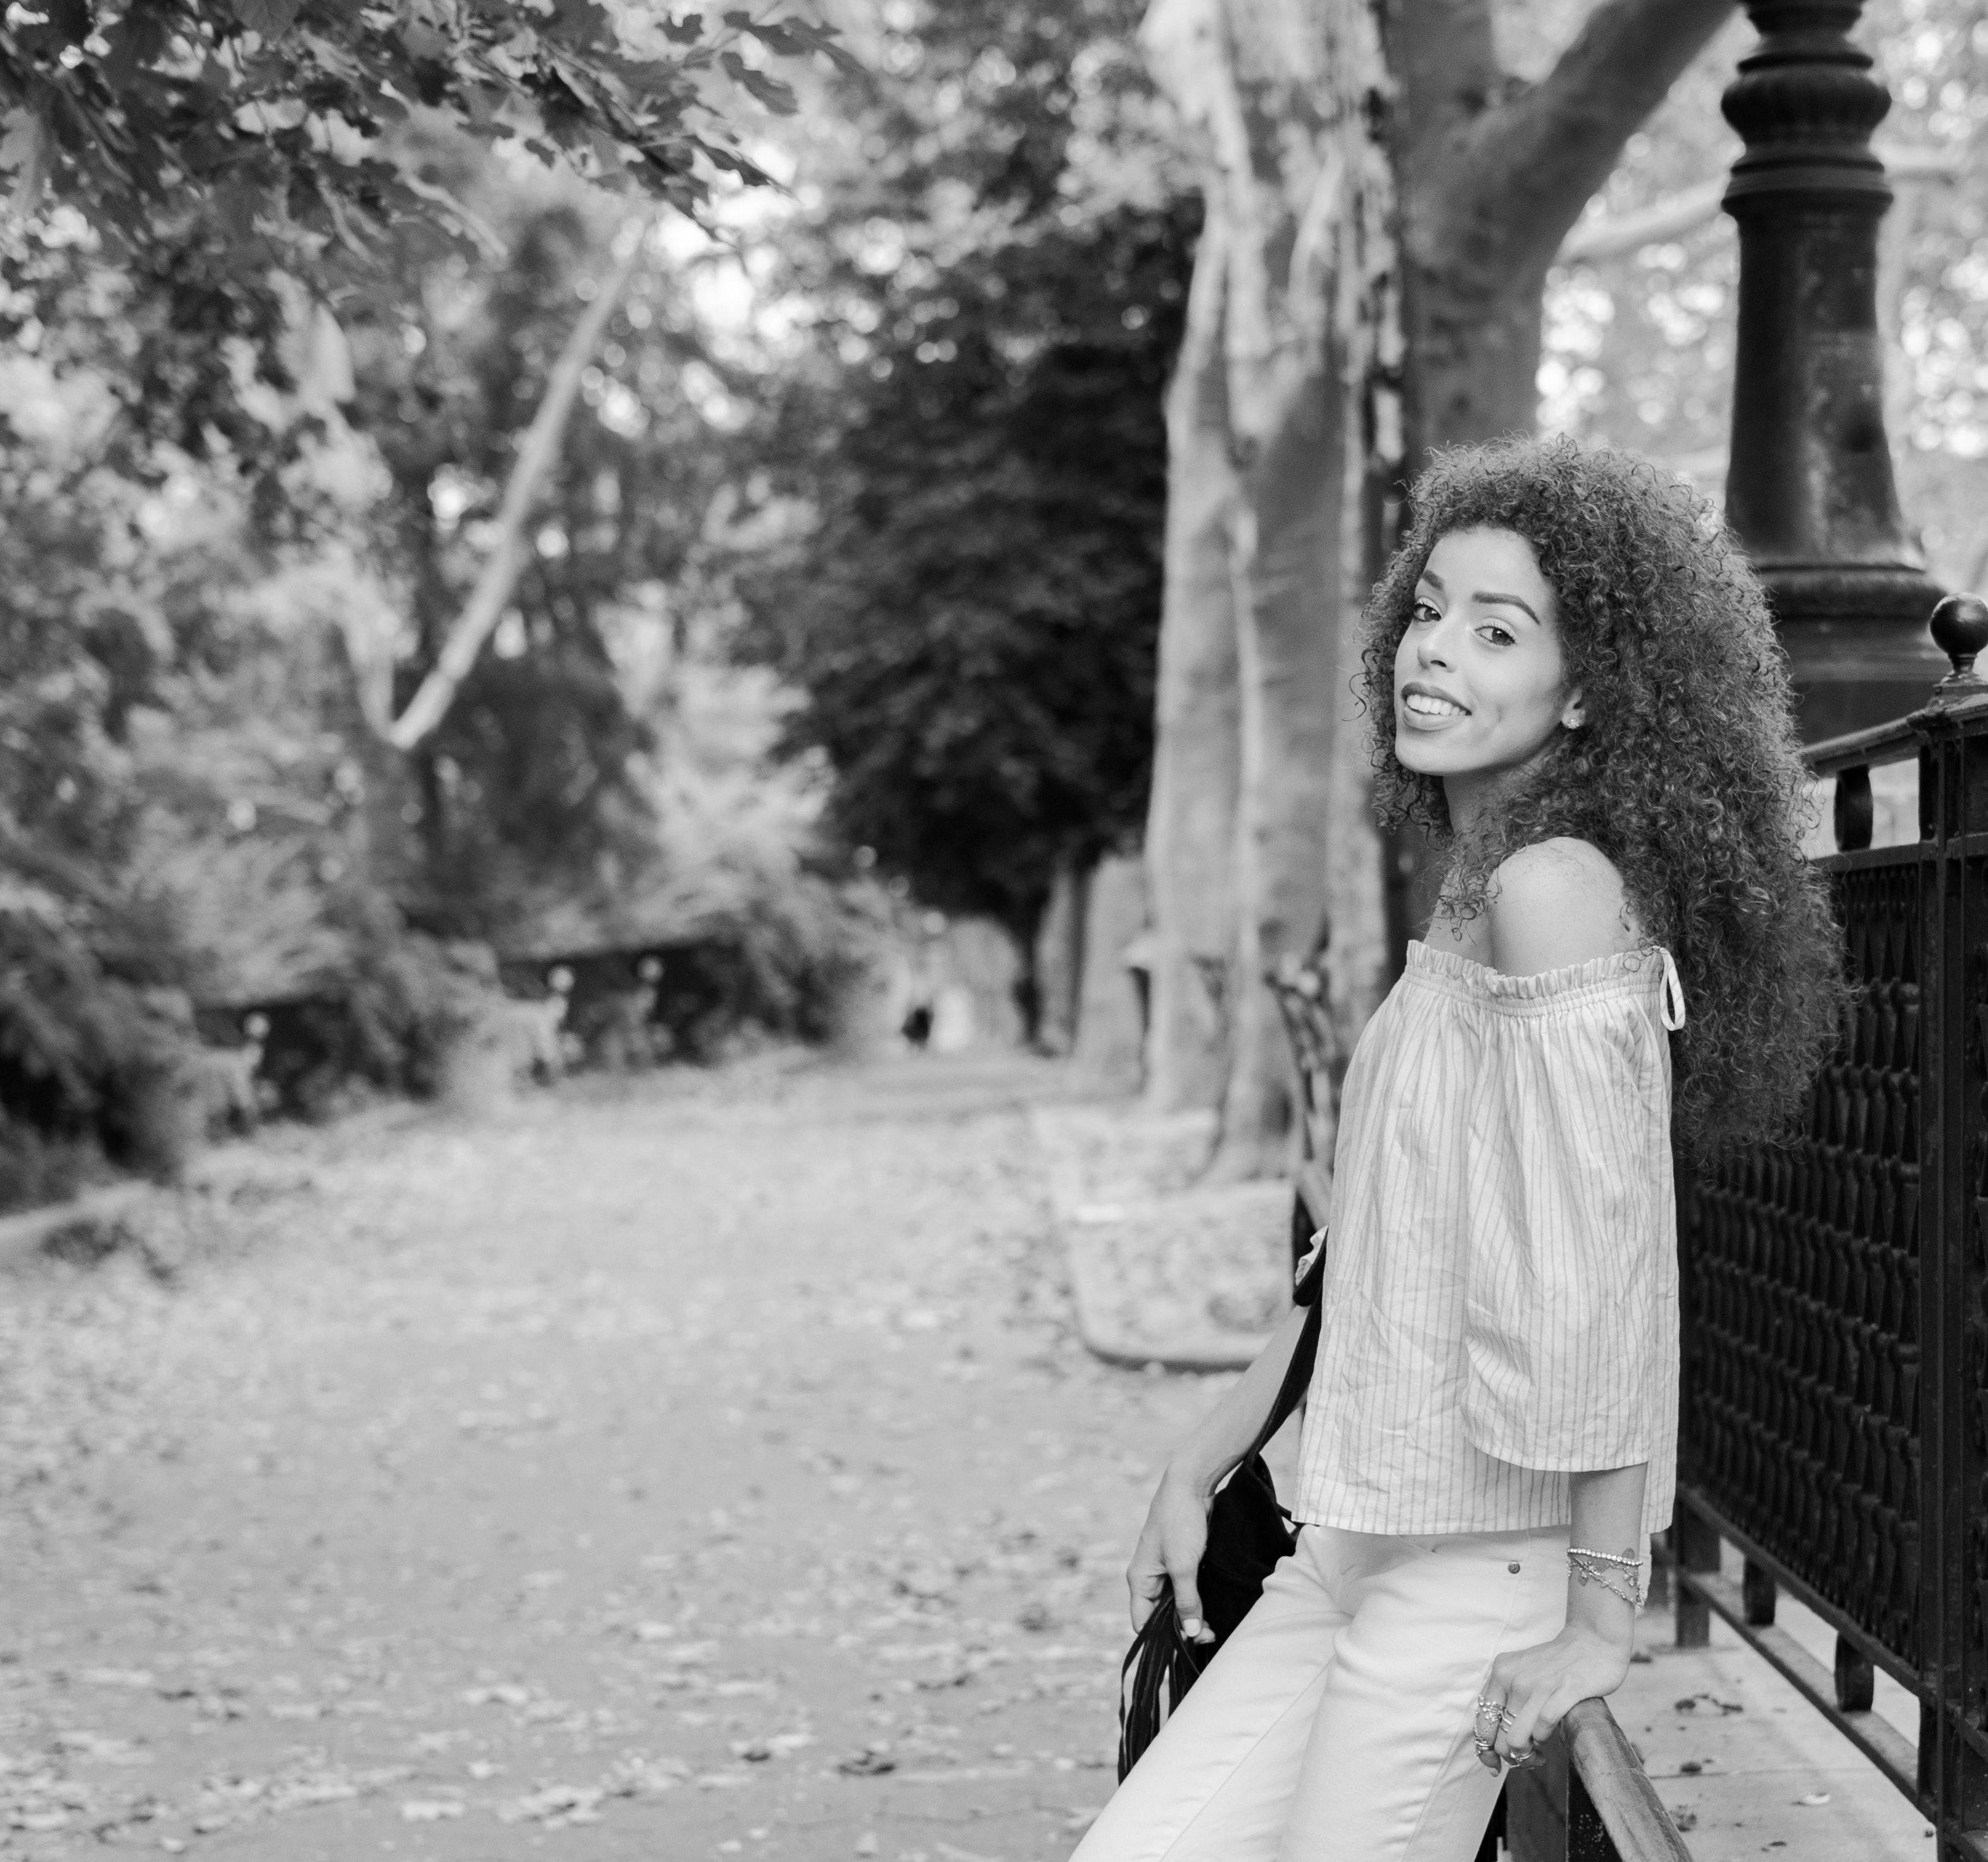 Alexis Gonzalez's Model portfolio